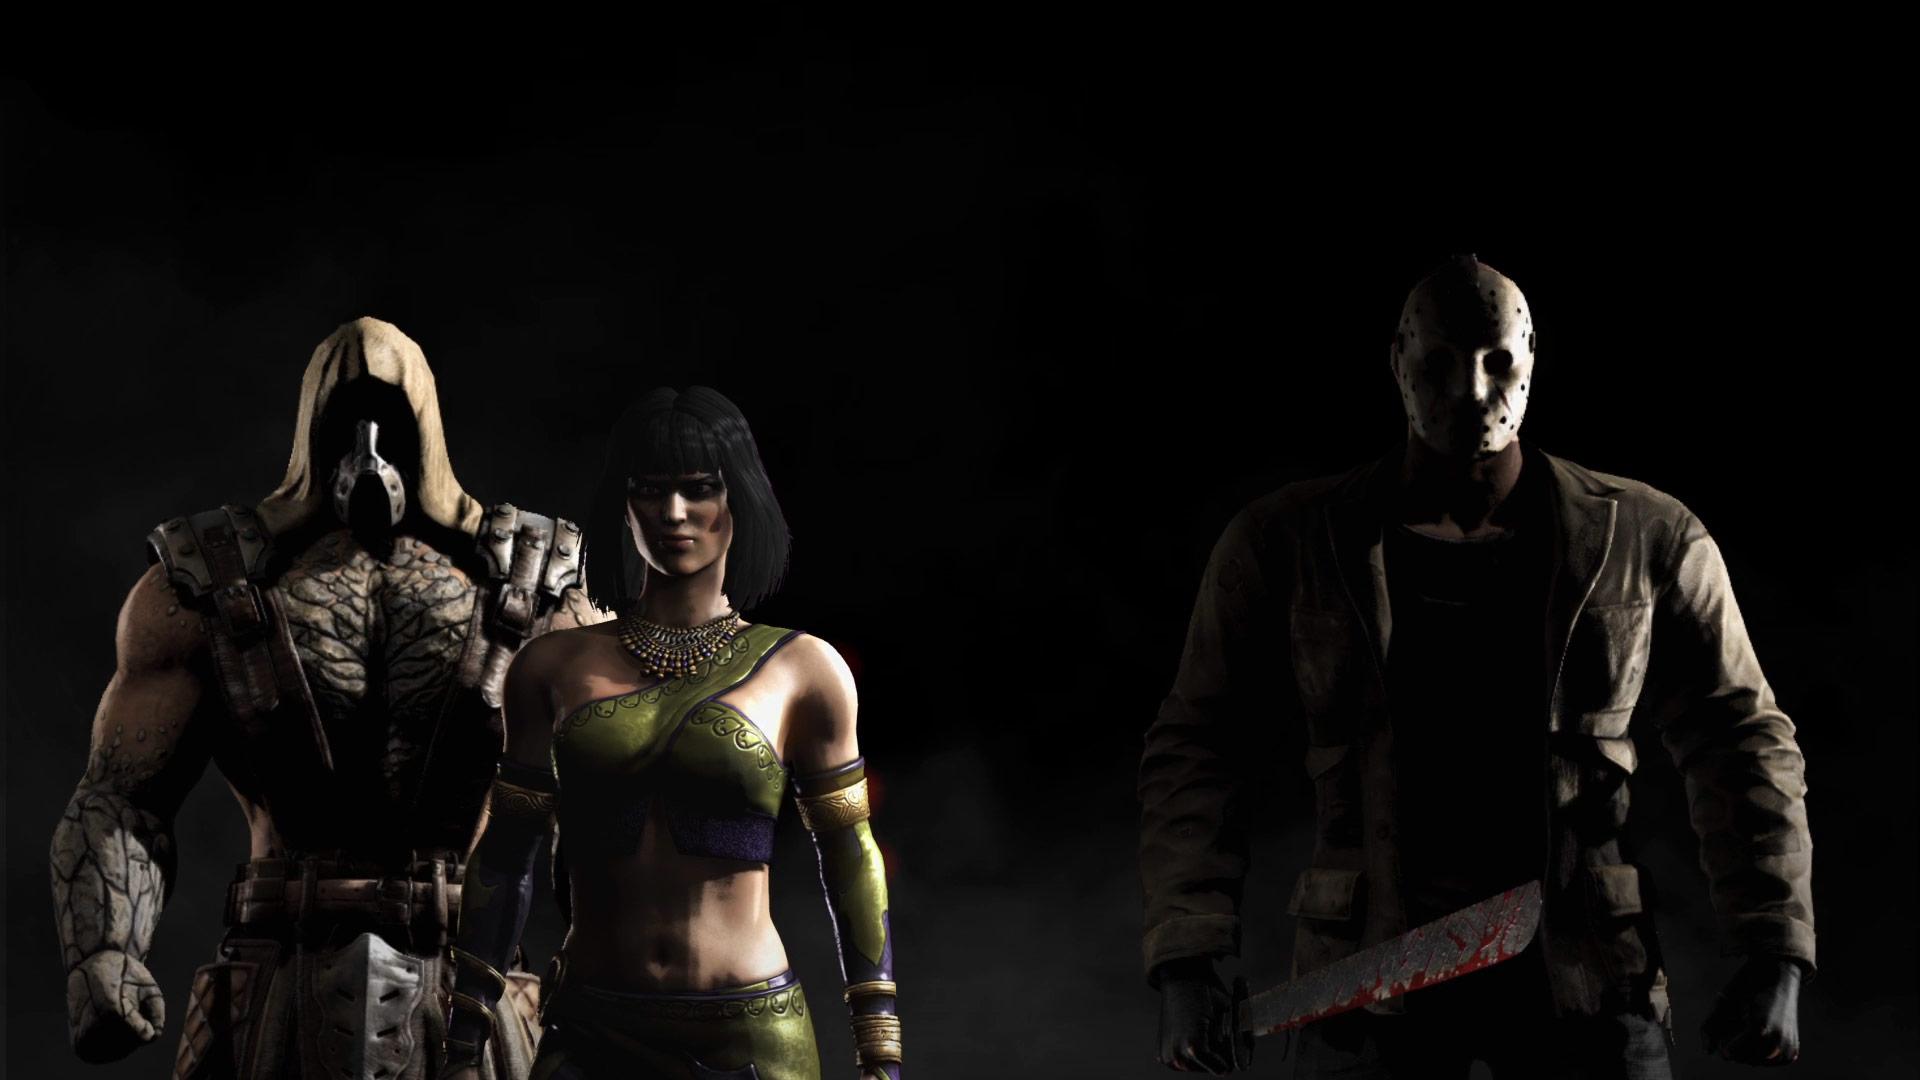 Tremor, Tanya, Predator, and Jason Voorhees are Mortal Kombat X's Kombat Pack characters #4